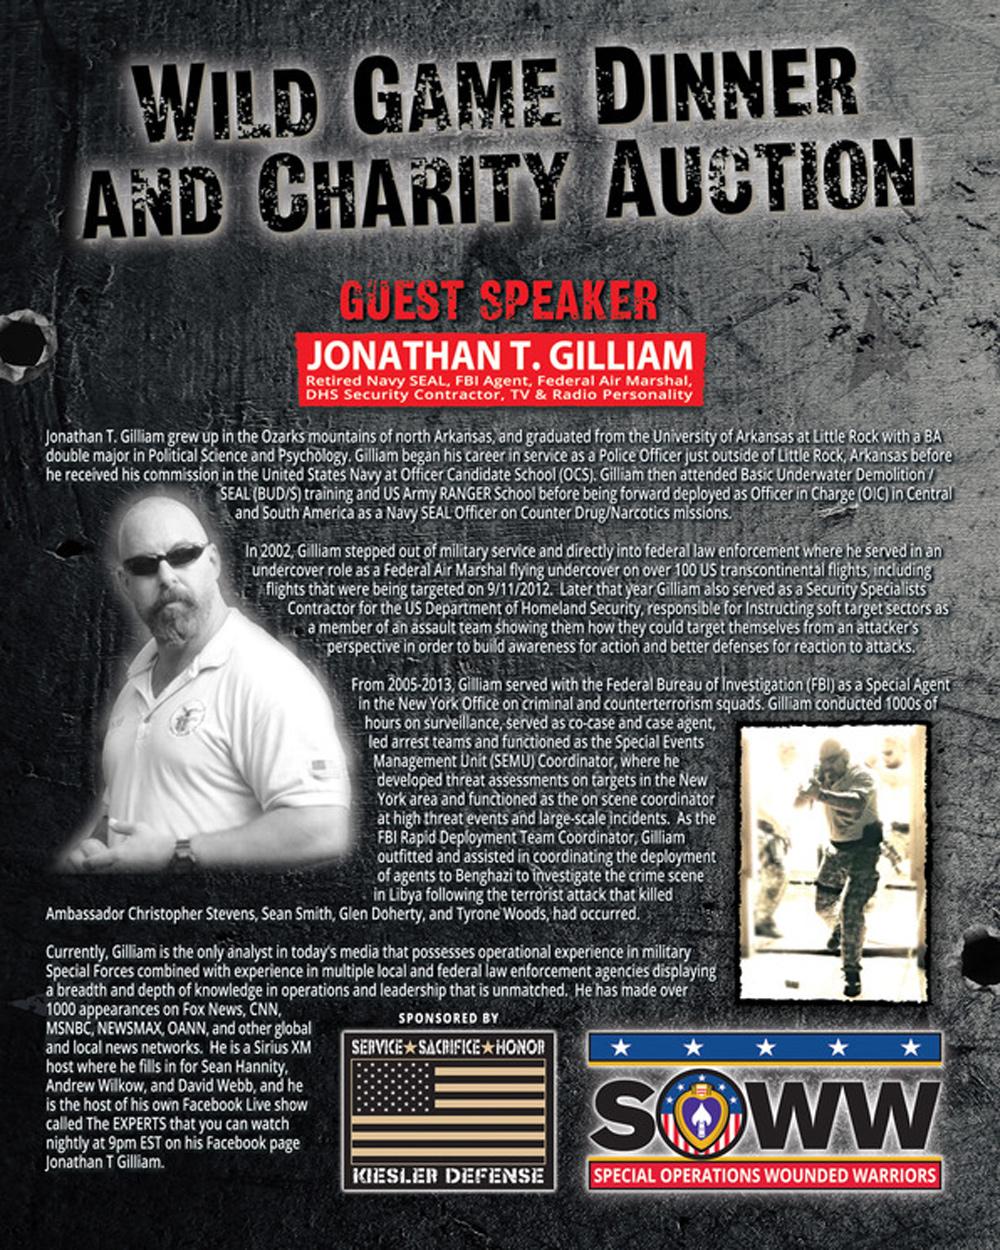 Guest Speaker Jonathan Gilliam